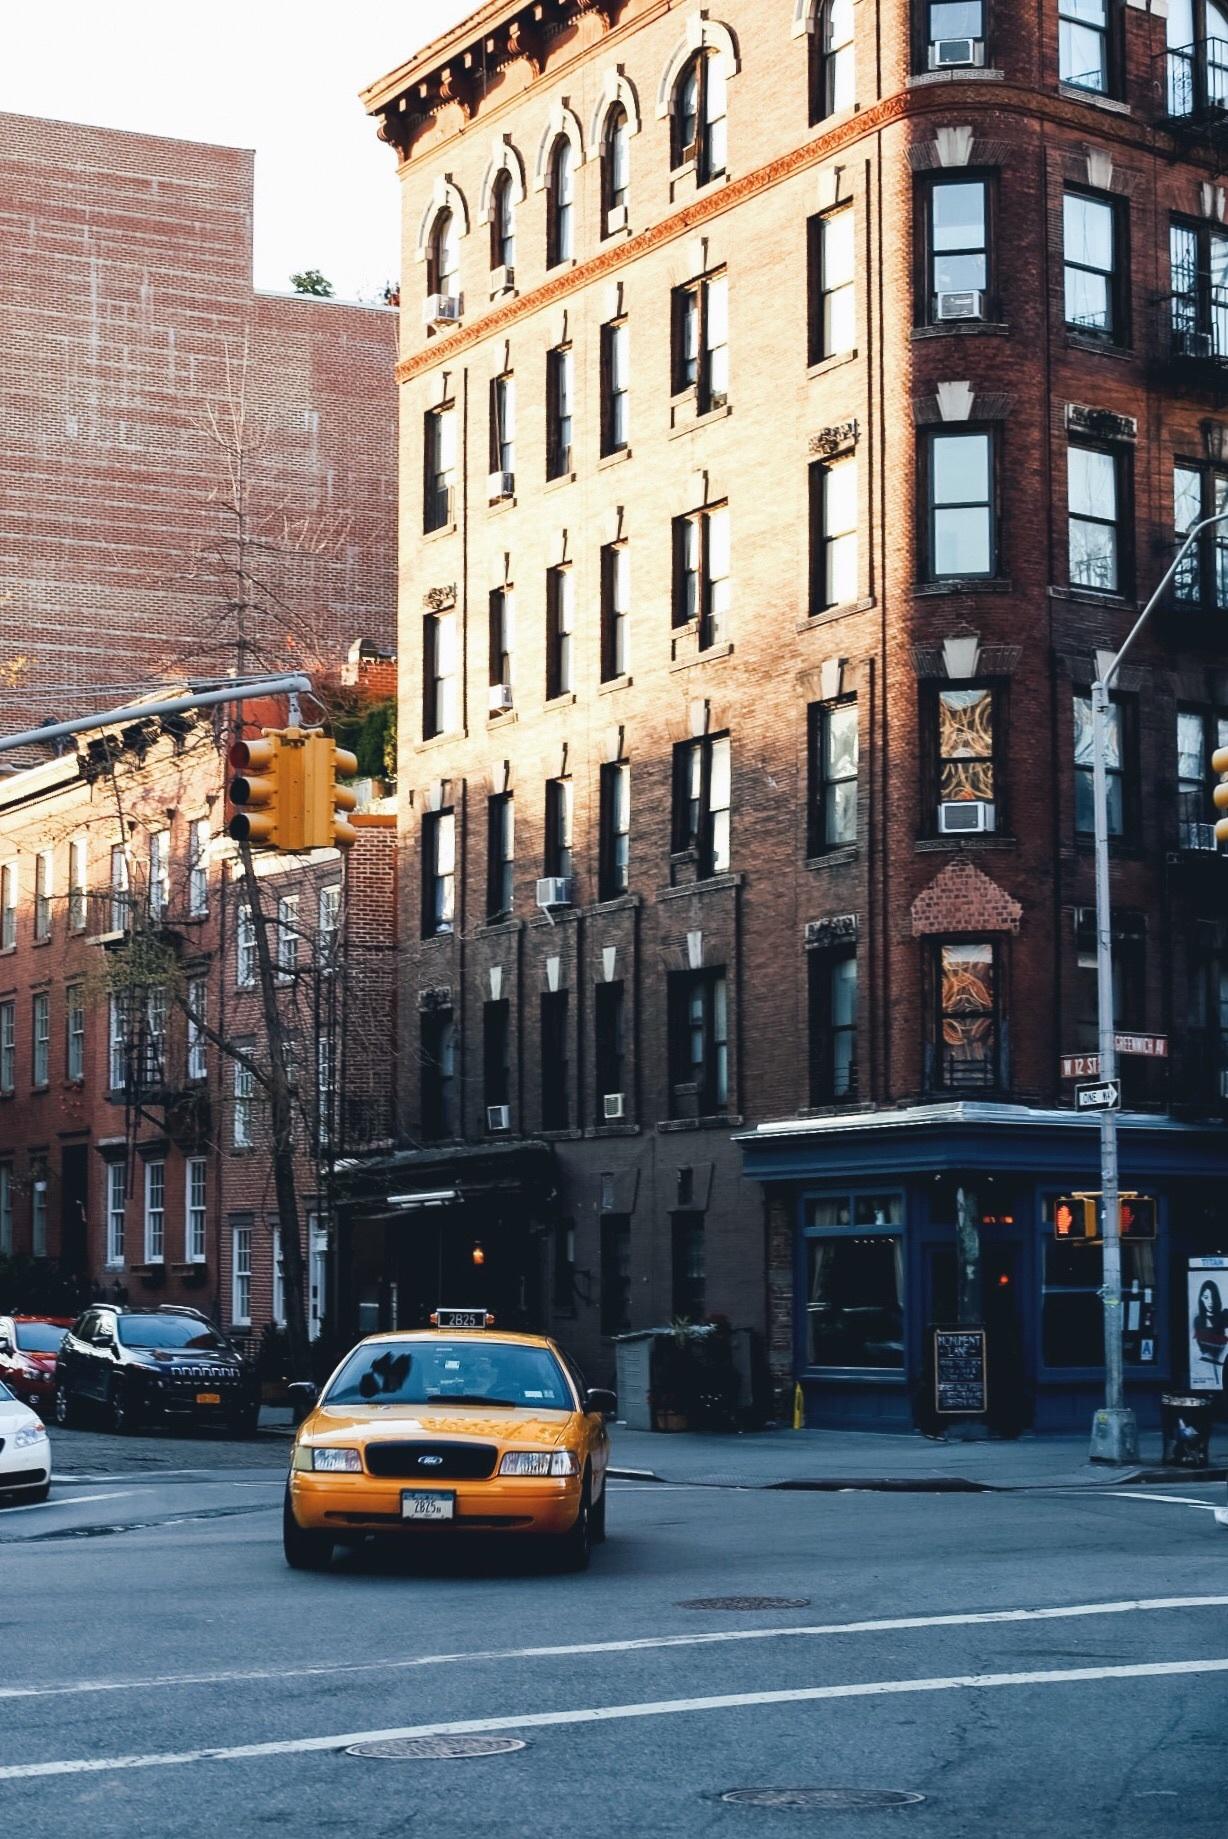 City Drive, Cab, Car, City, Drive, HQ Photo